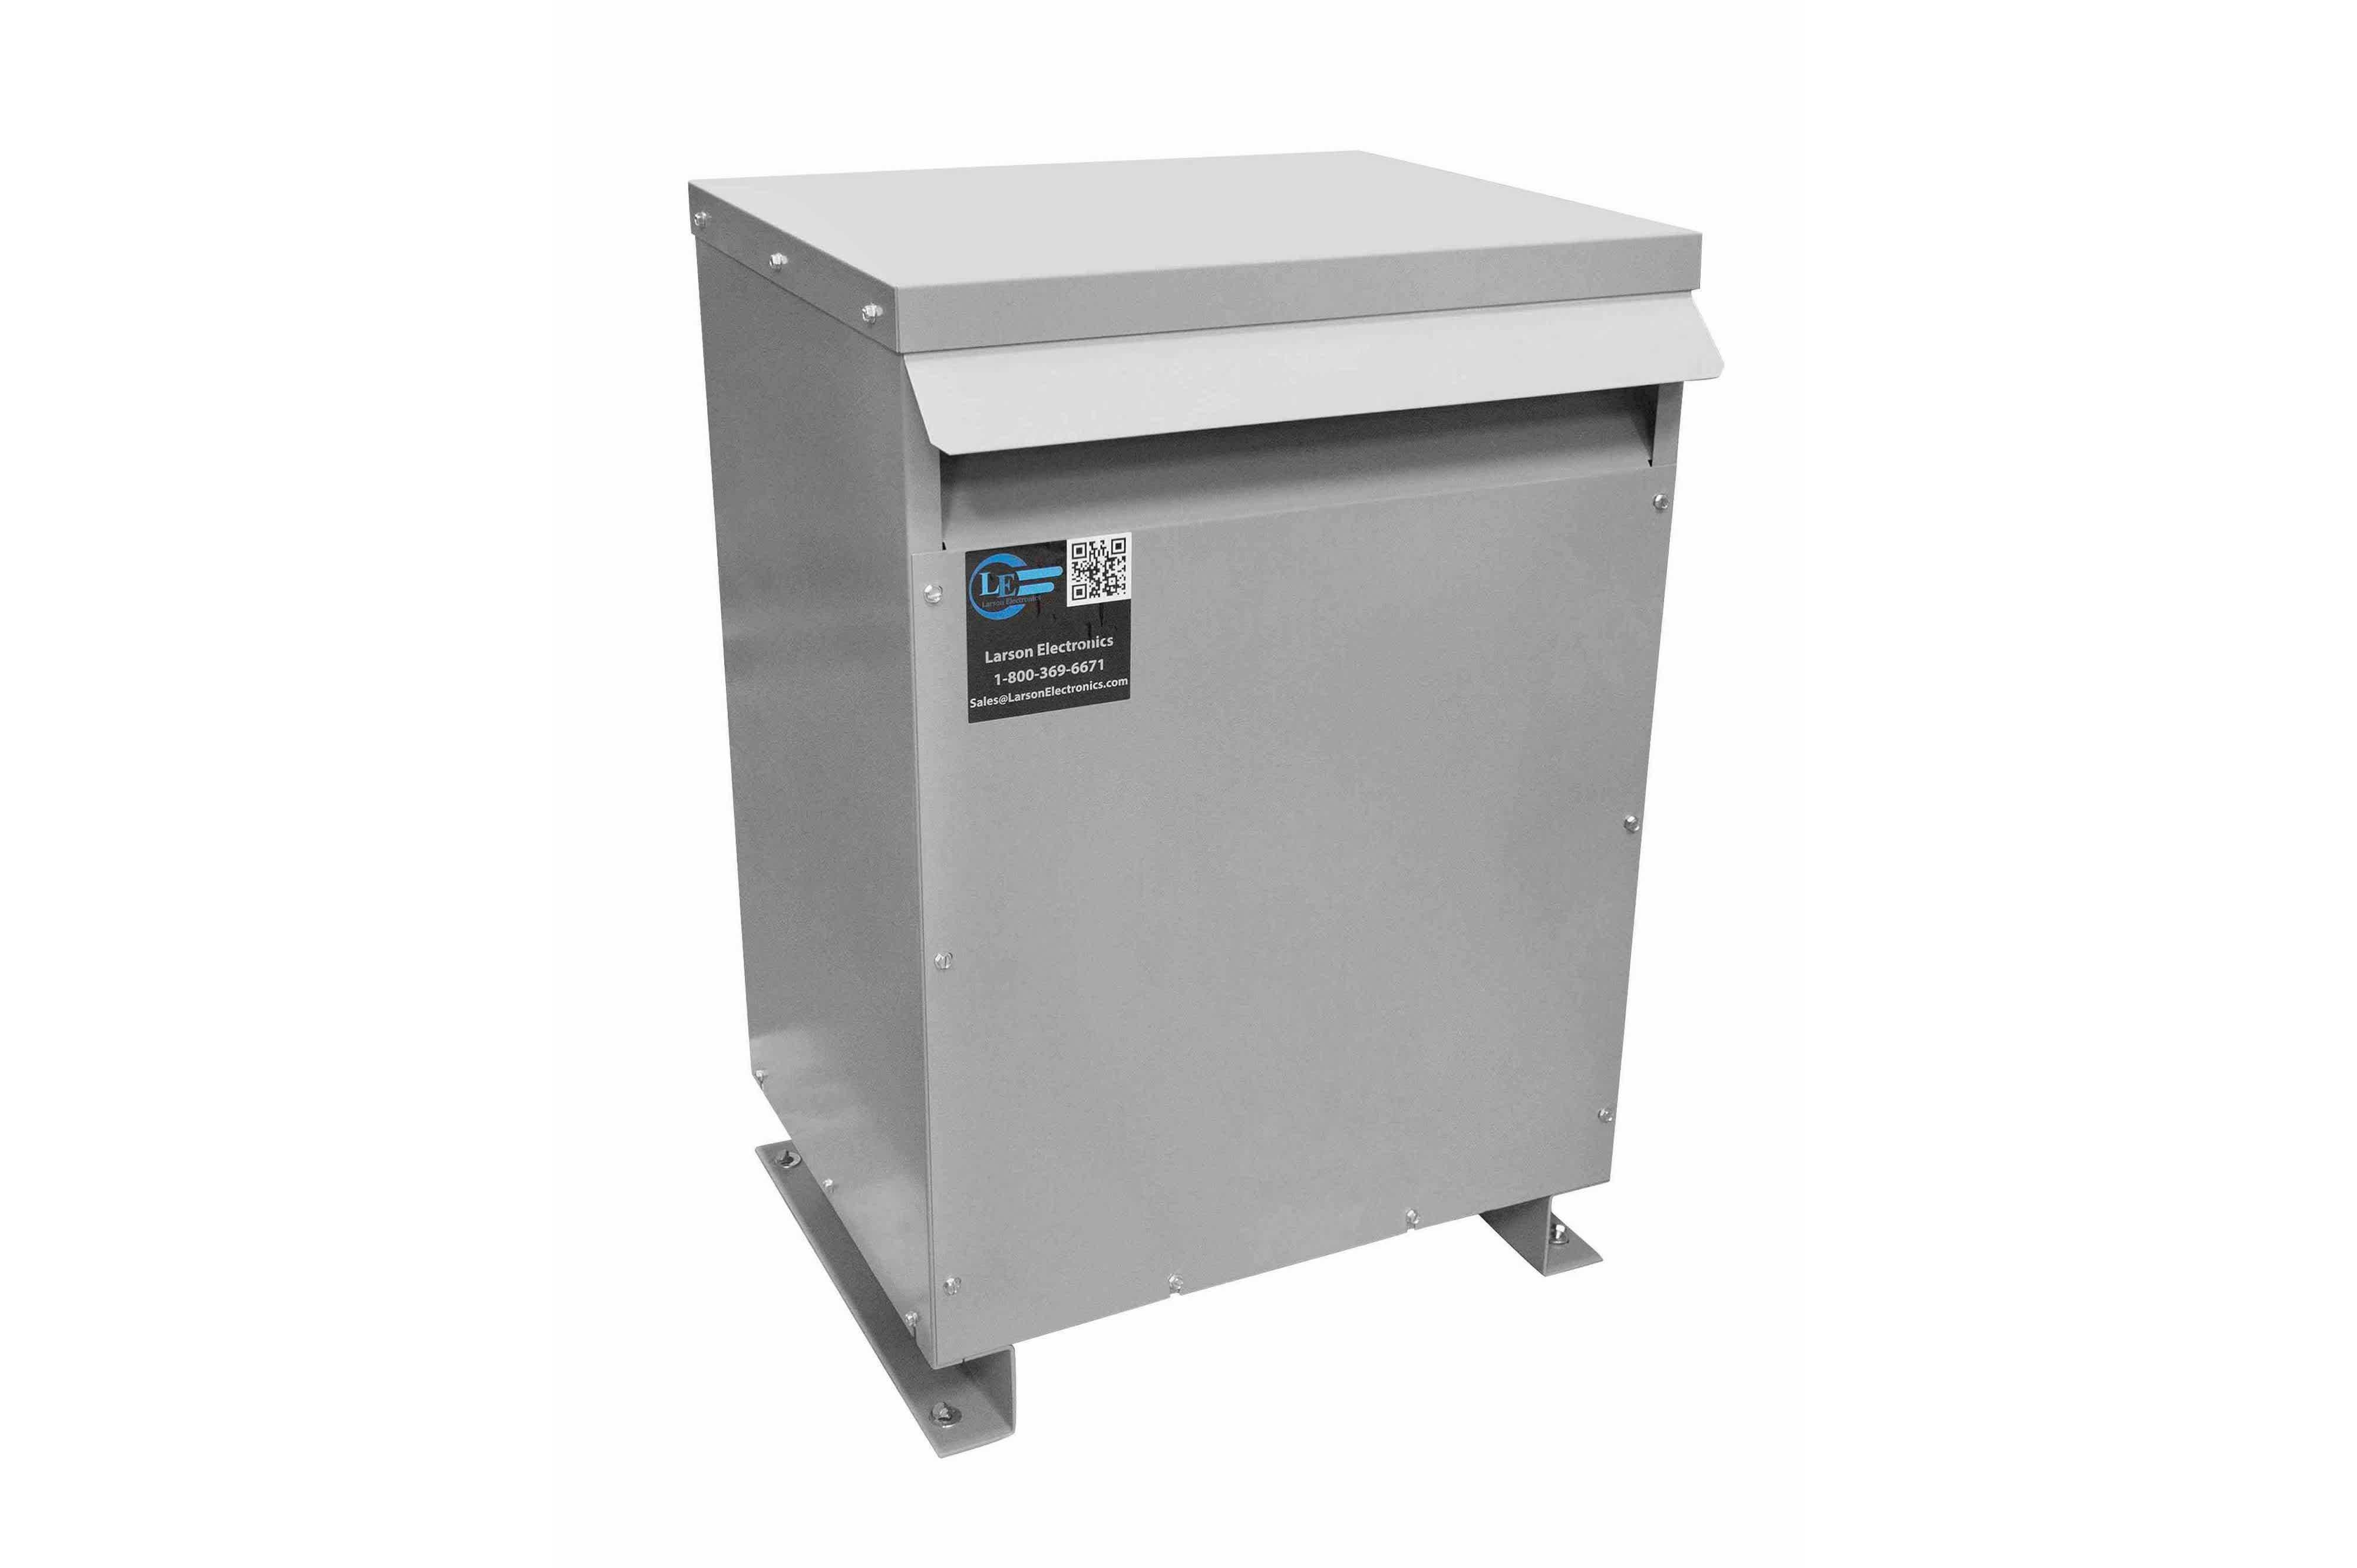 500 kVA 3PH Isolation Transformer, 460V Wye Primary, 240V/120 Delta Secondary, N3R, Ventilated, 60 Hz